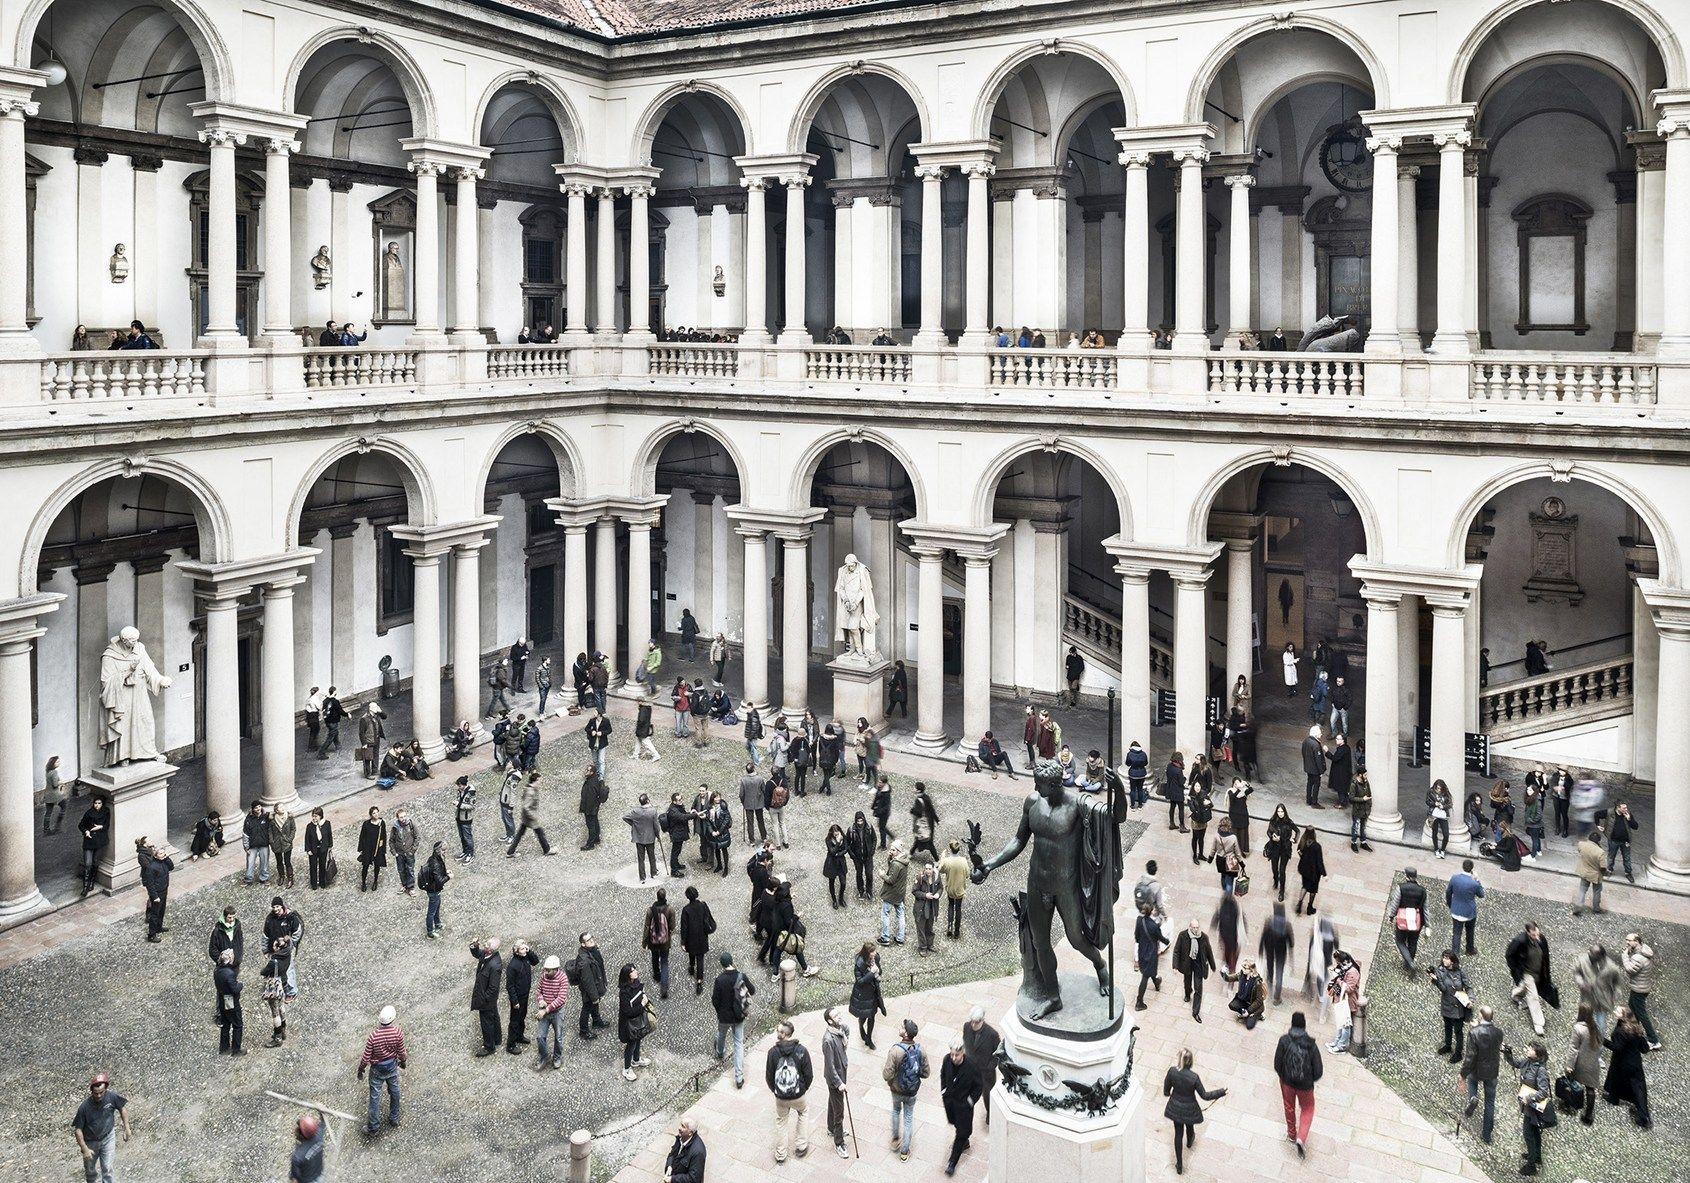 Cosmo Laera - The heart of art #1, Milano 2014